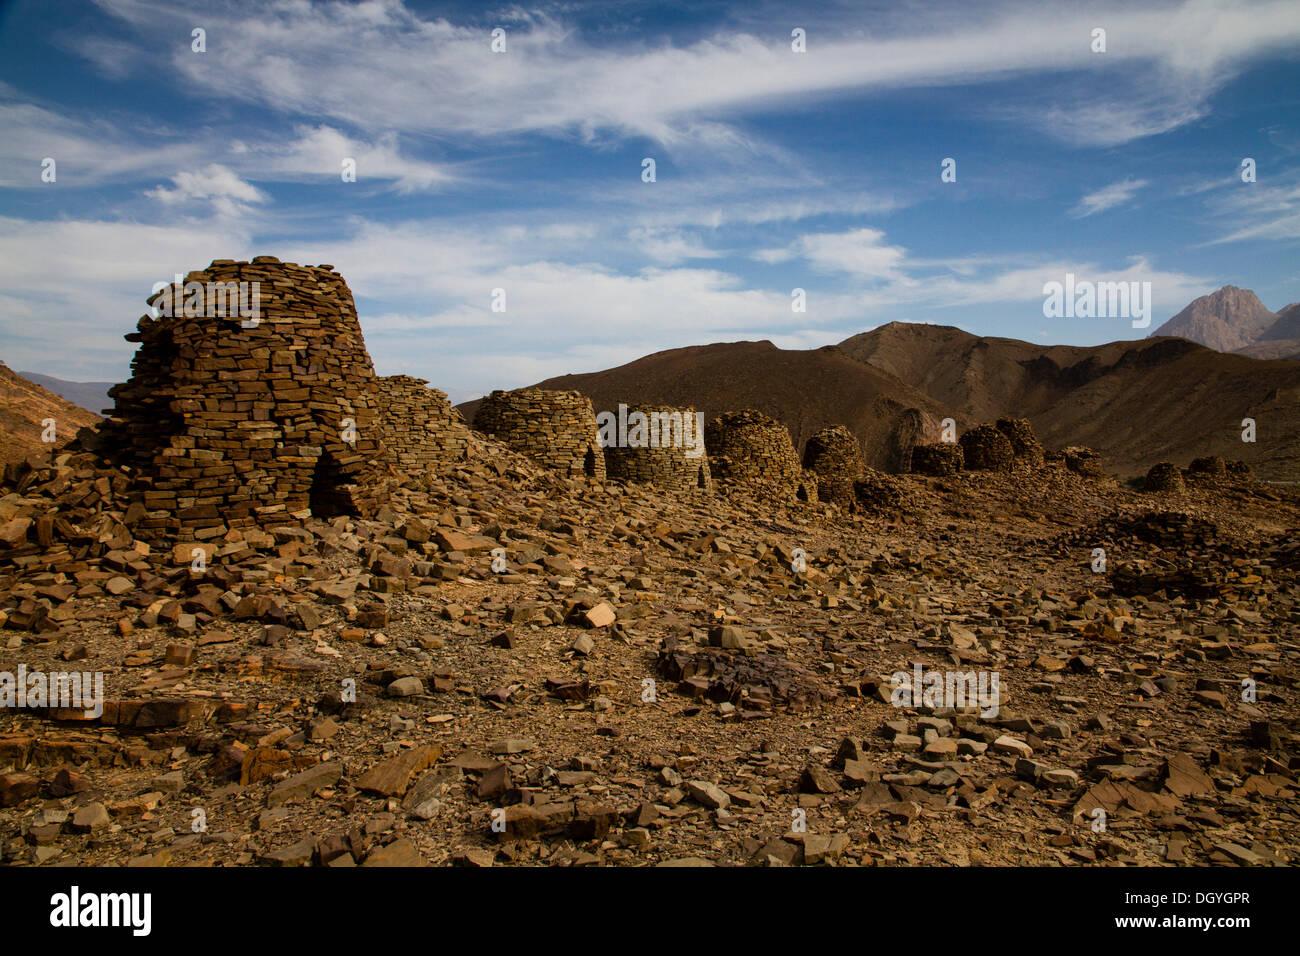 Archaeological site of Al-Ayn, UNESCO World Heritage site, Al-Ayn, Oman - Stock Image